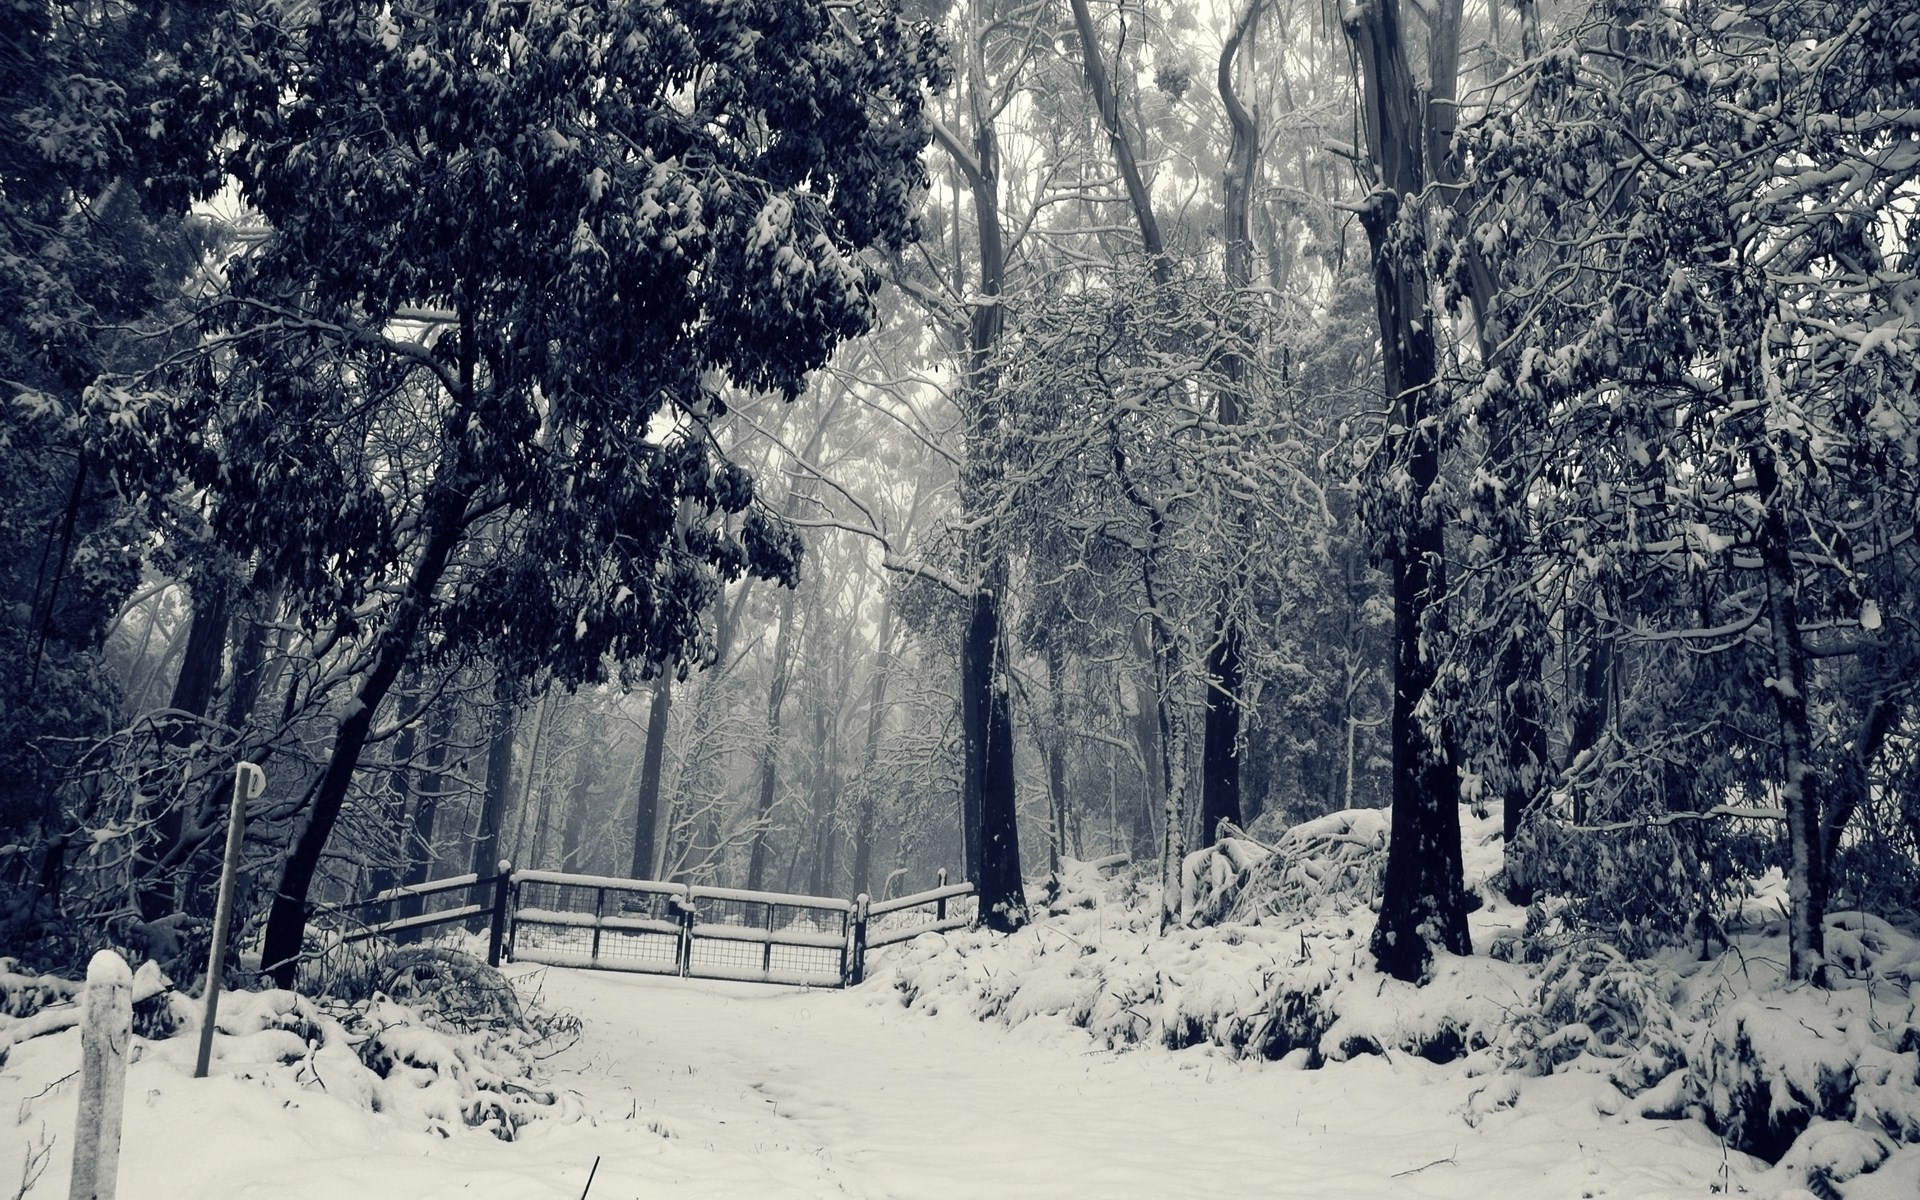 christmas-winter-wonderland-backgroundwinter-wonderland-wallpapers---full-hd-wallpaper-search-agmfwnaj